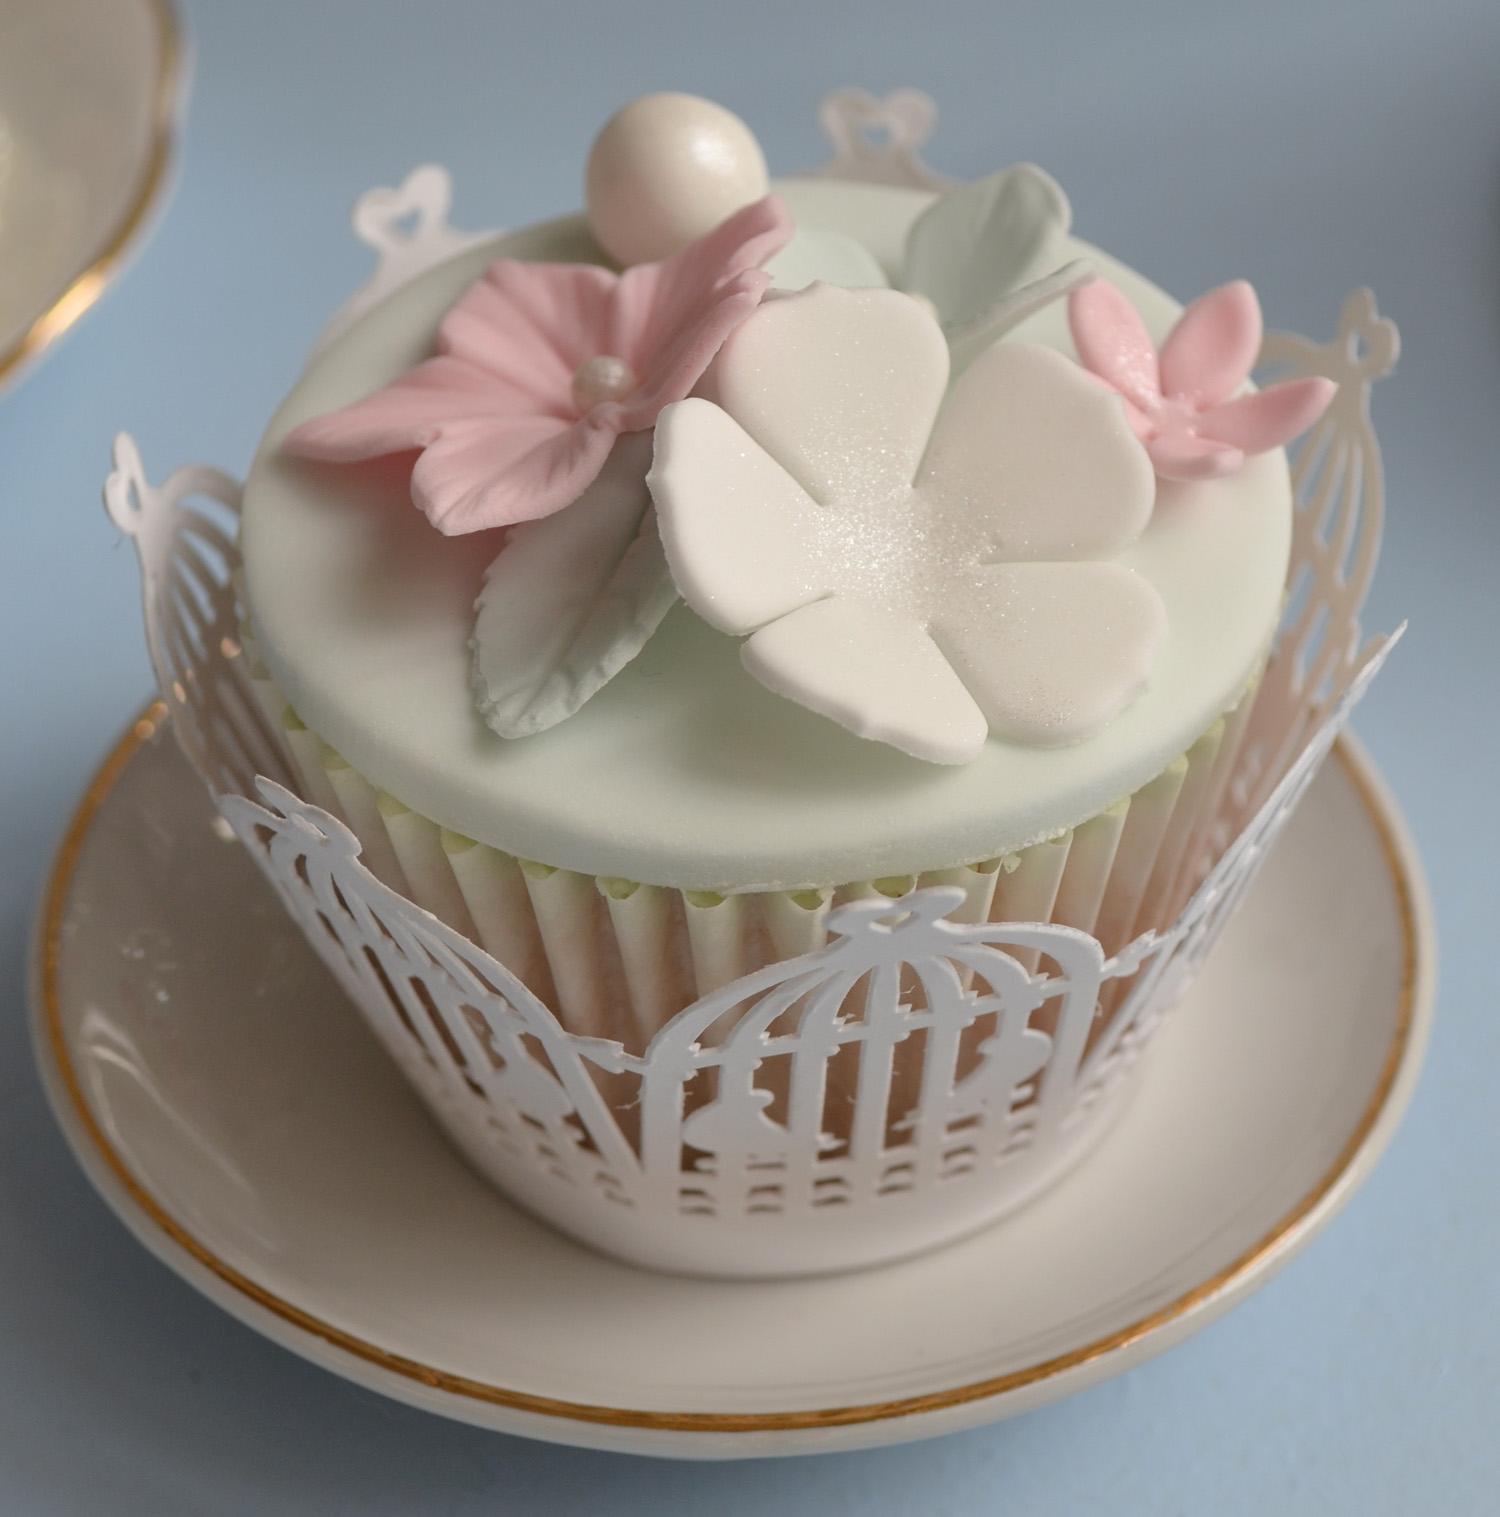 Cupcake Wedding Cakes: Little Paper Cakes: Vintage Wedding Cupcakes